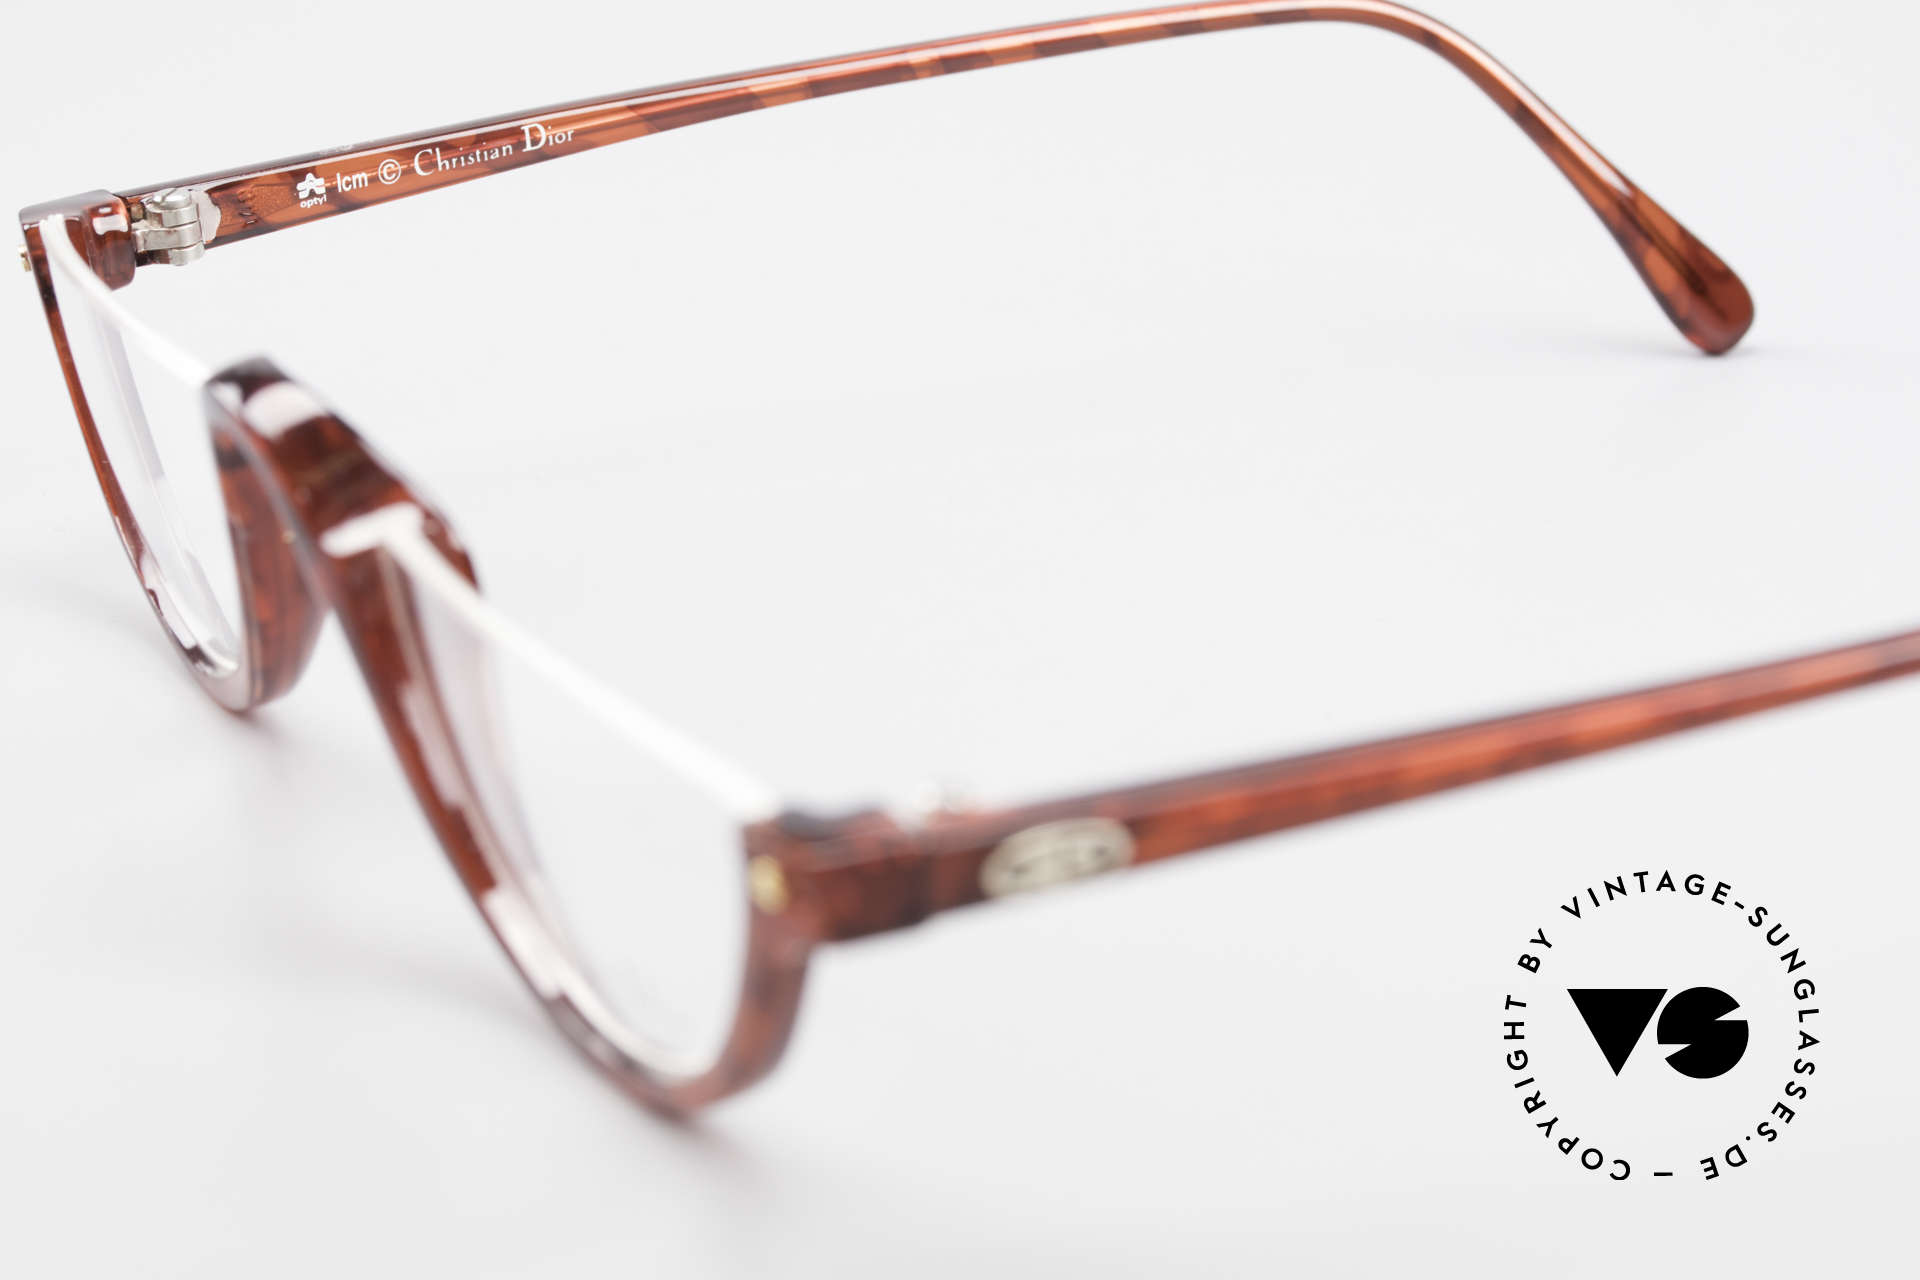 Christian Dior 2586 Reading Glasses Unisex 90's, unworn, NOS (like all our vintage reading eyeglasses), Made for Men and Women